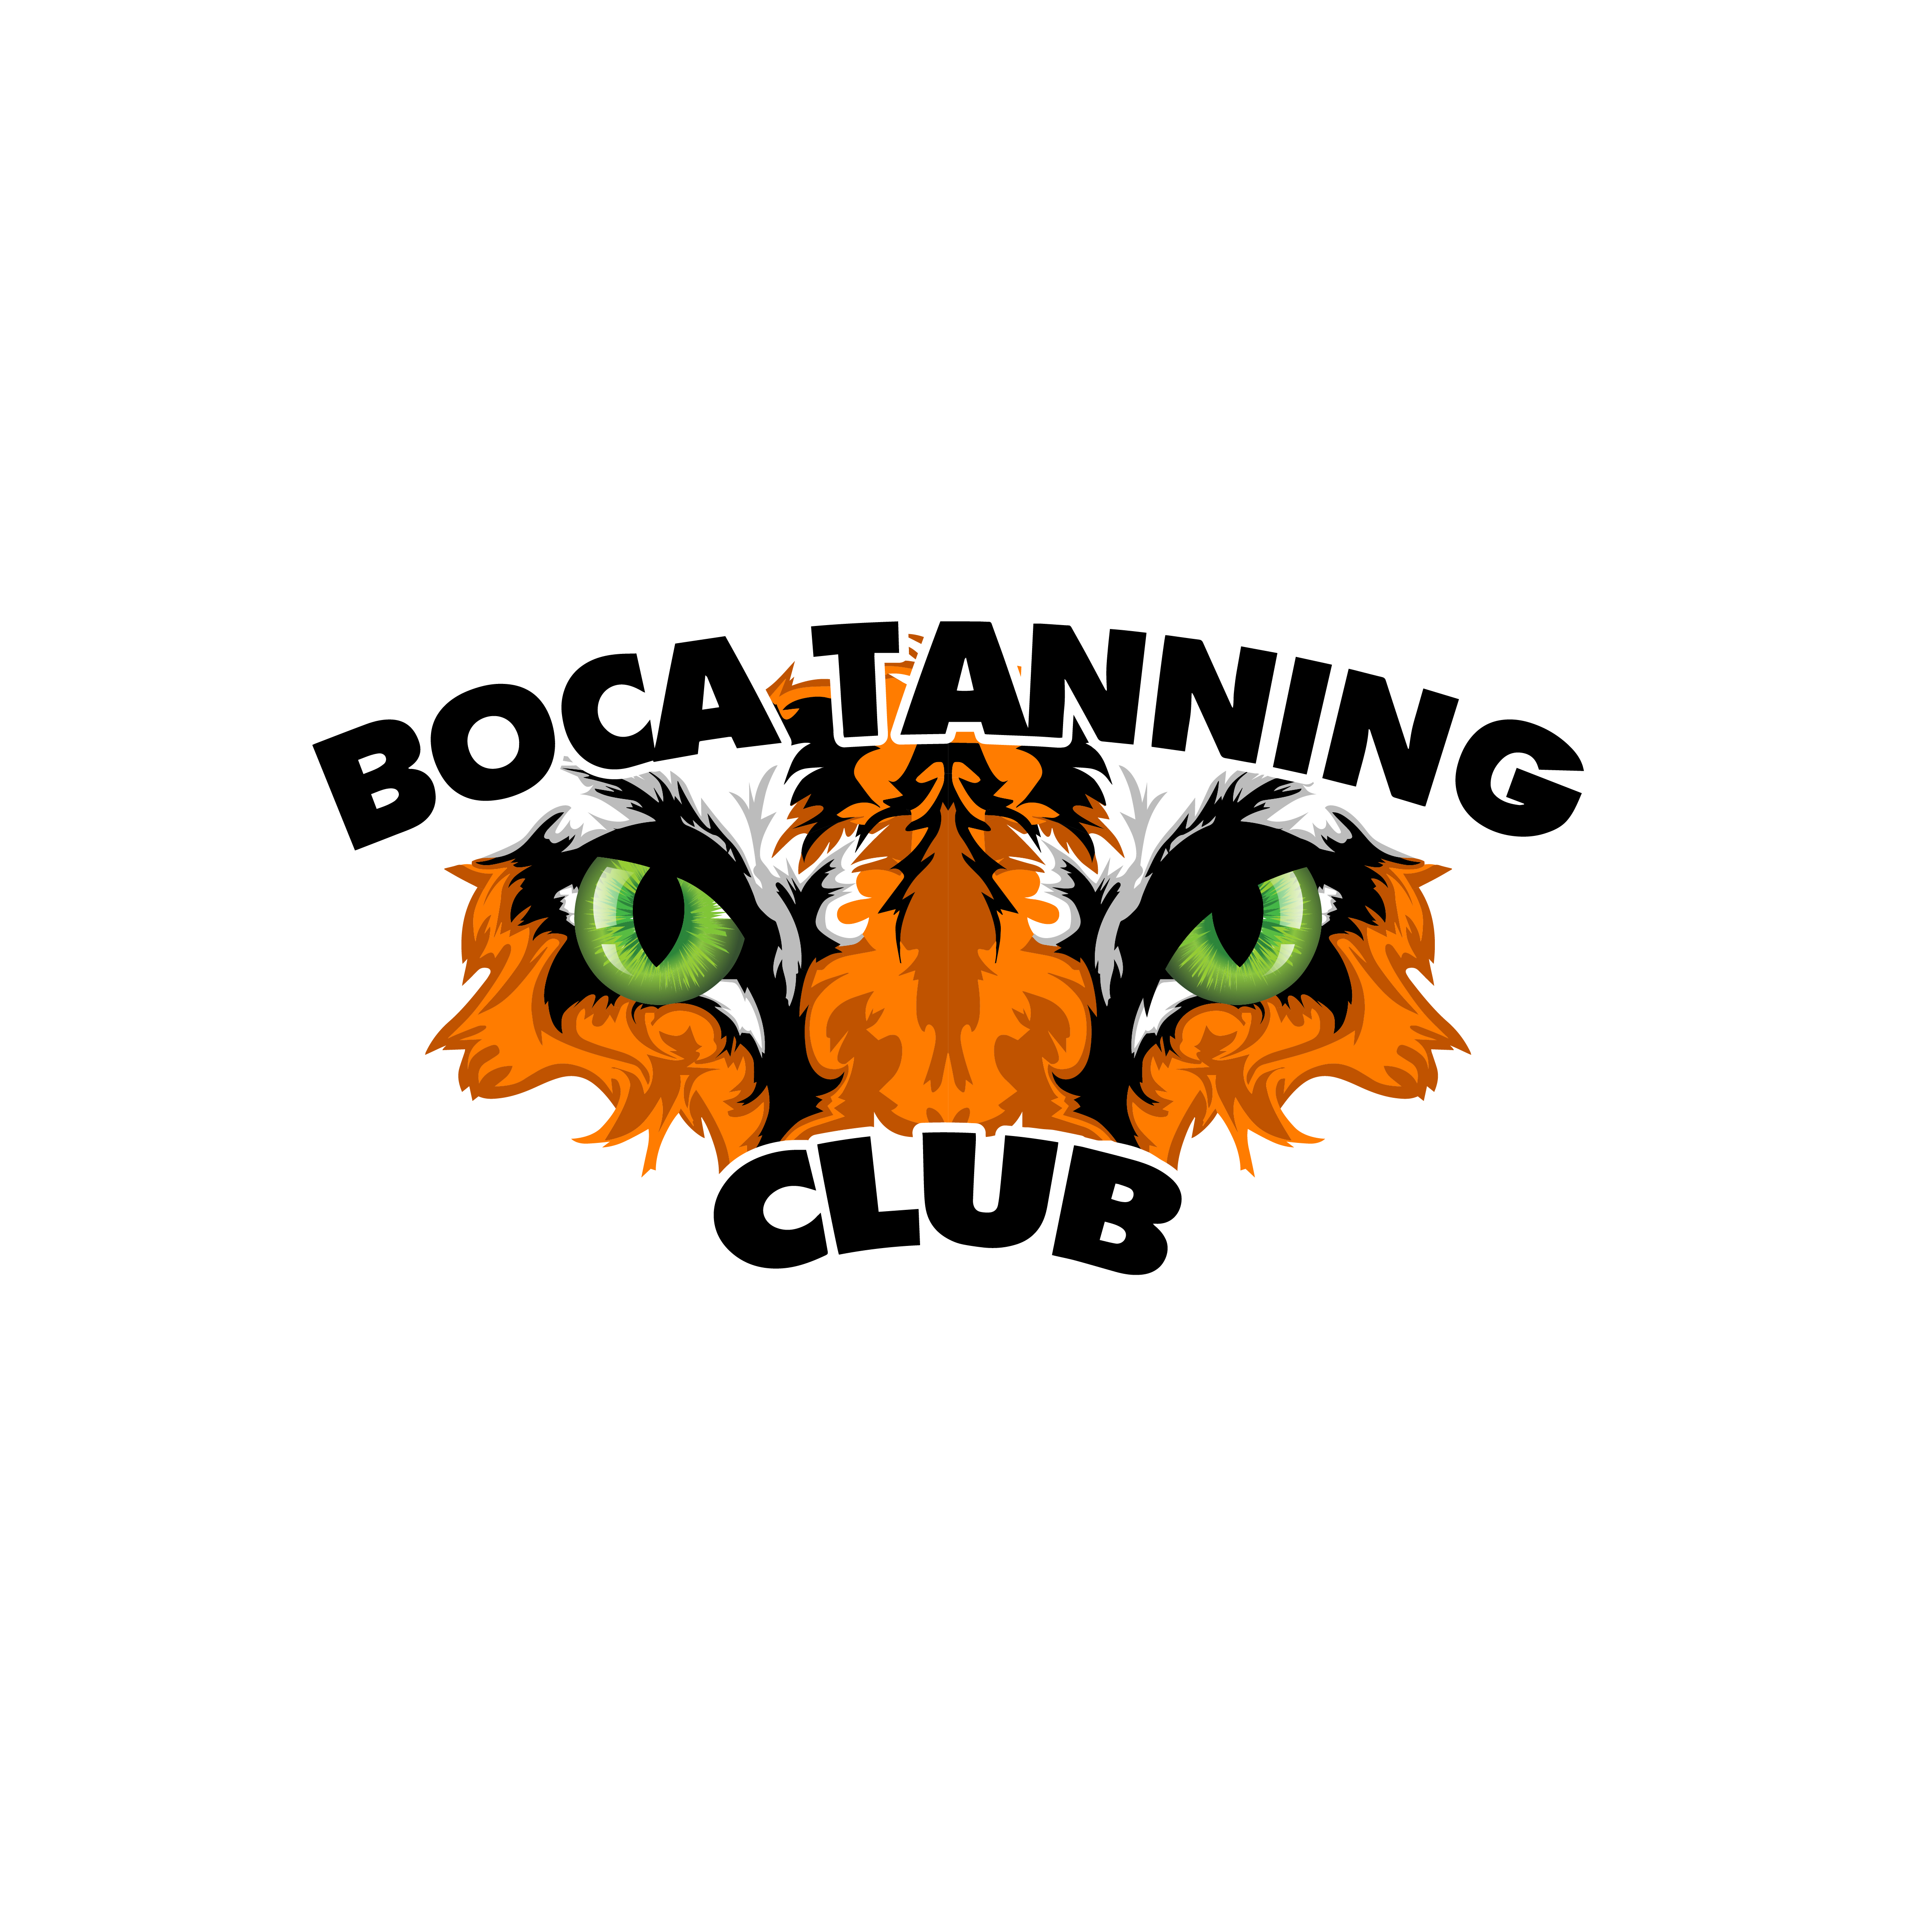 Introducing Boca Tanning Club in East Boca Raton, Florida